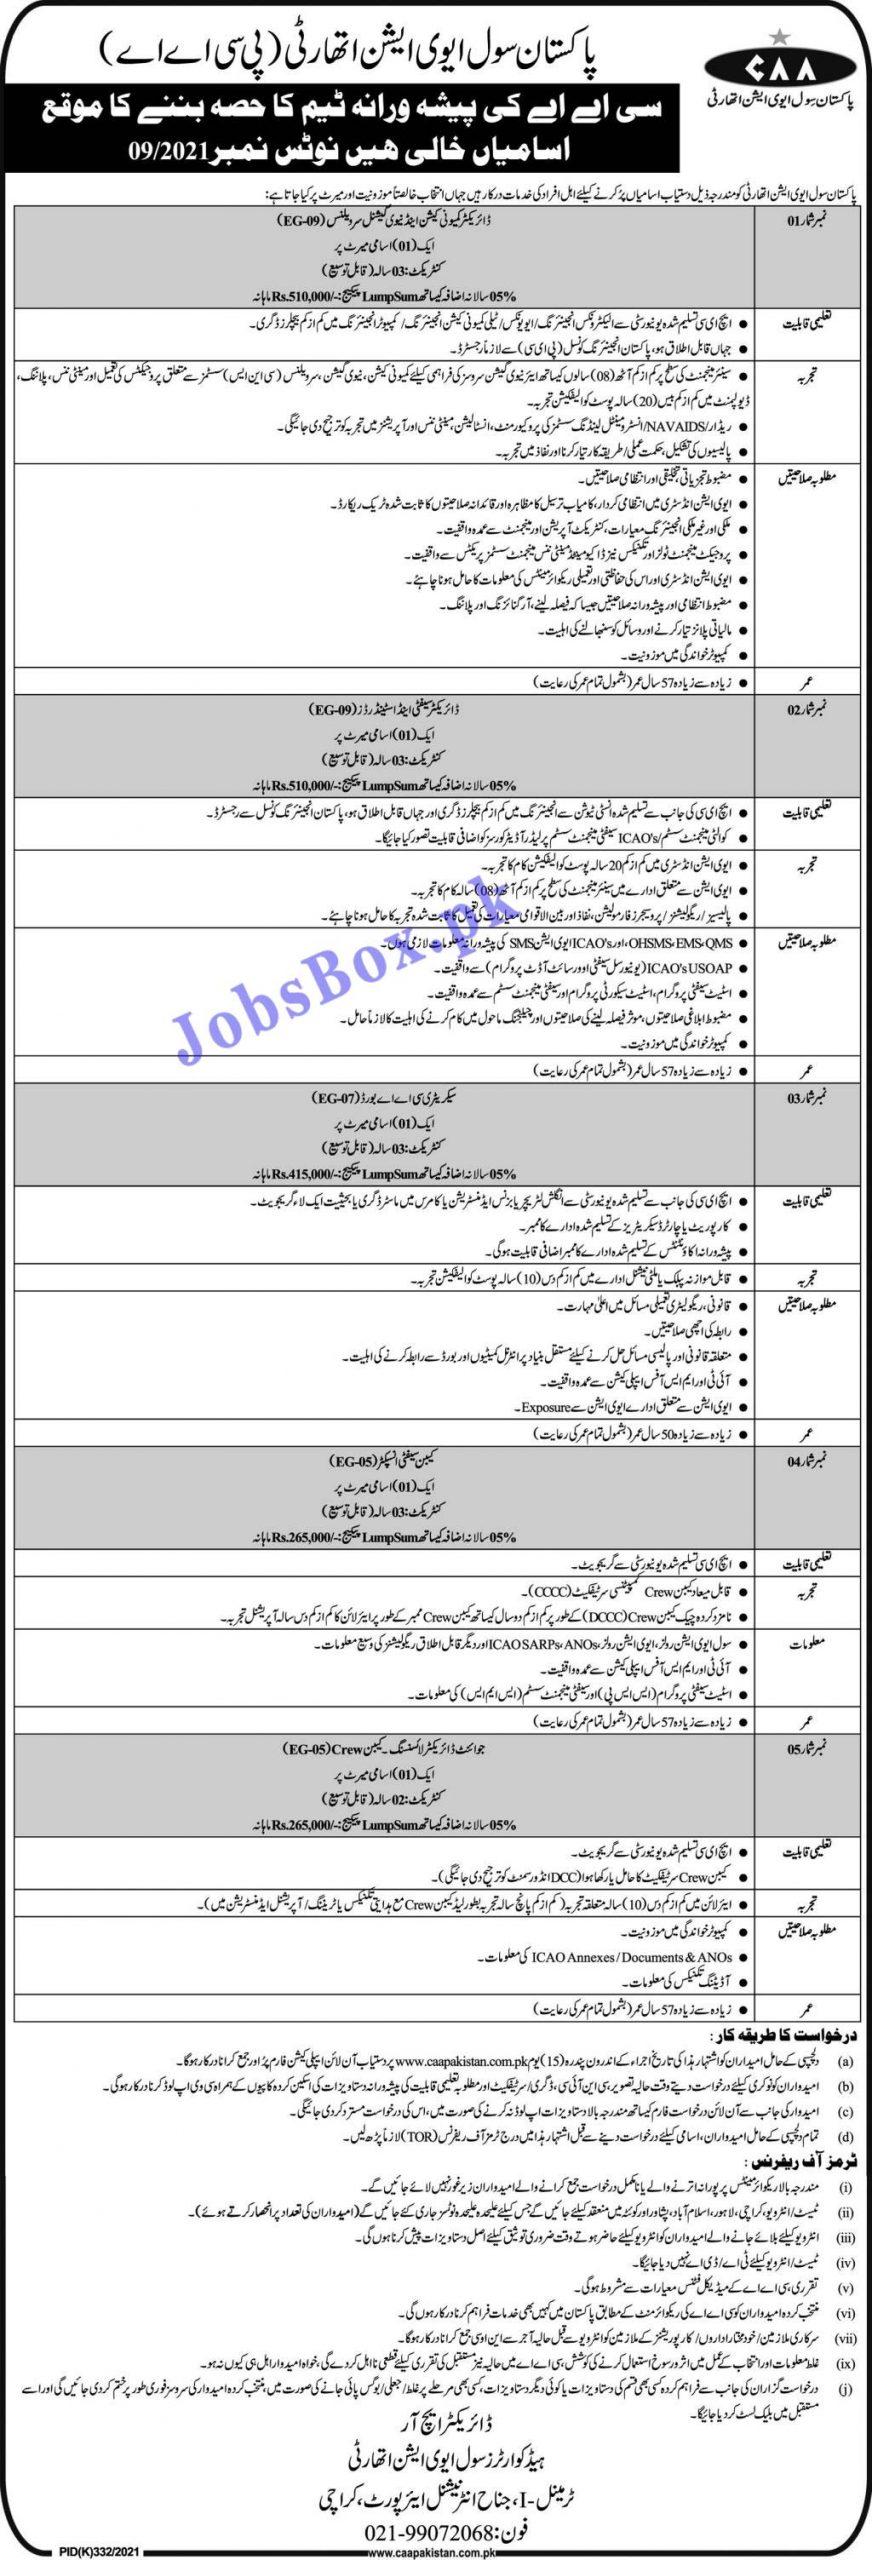 www.caapakistan.com.pk Jobs 2021 - Pakistan Civil Aviation Authority PCAA Jobs 2021 in Pakistan